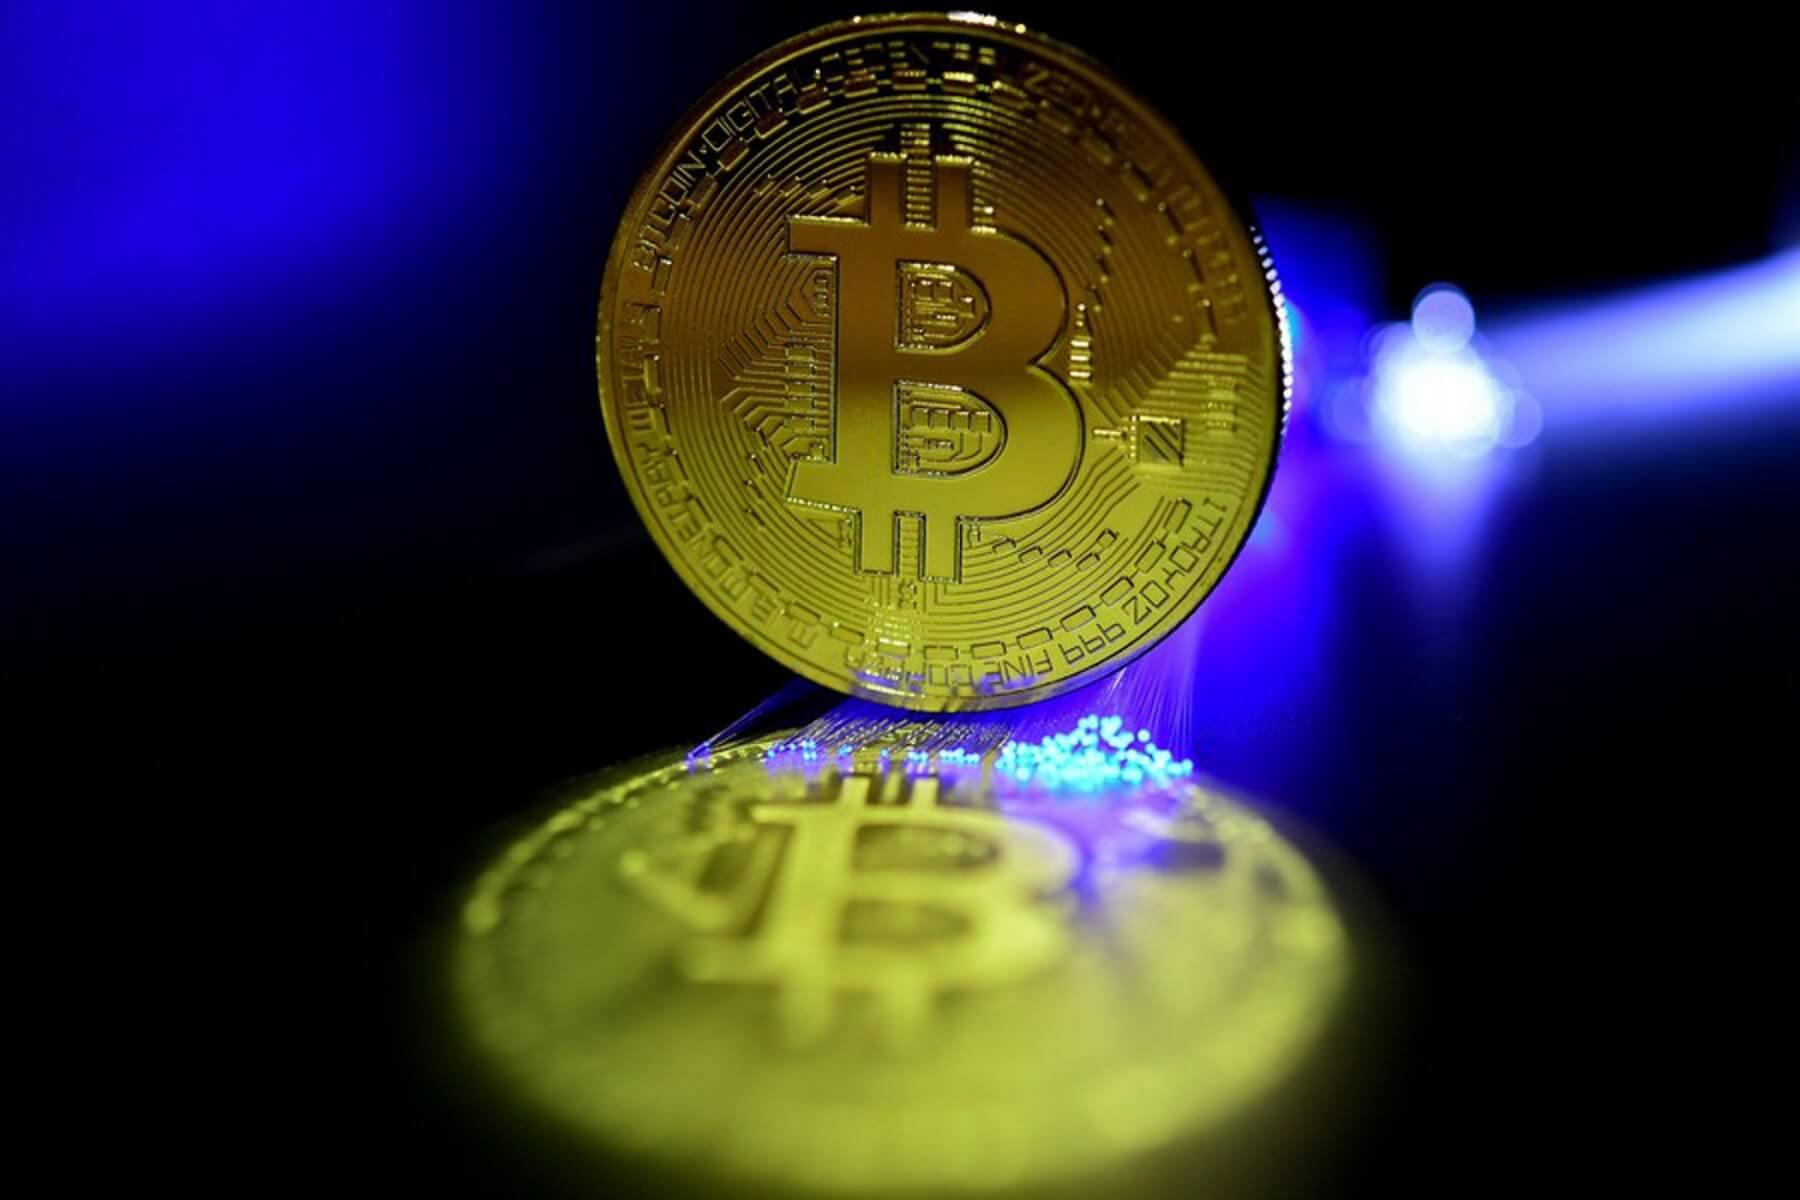 Bitcoin: Έσπασε το ιστορικό φράγμα των 60.000 δολαρίων